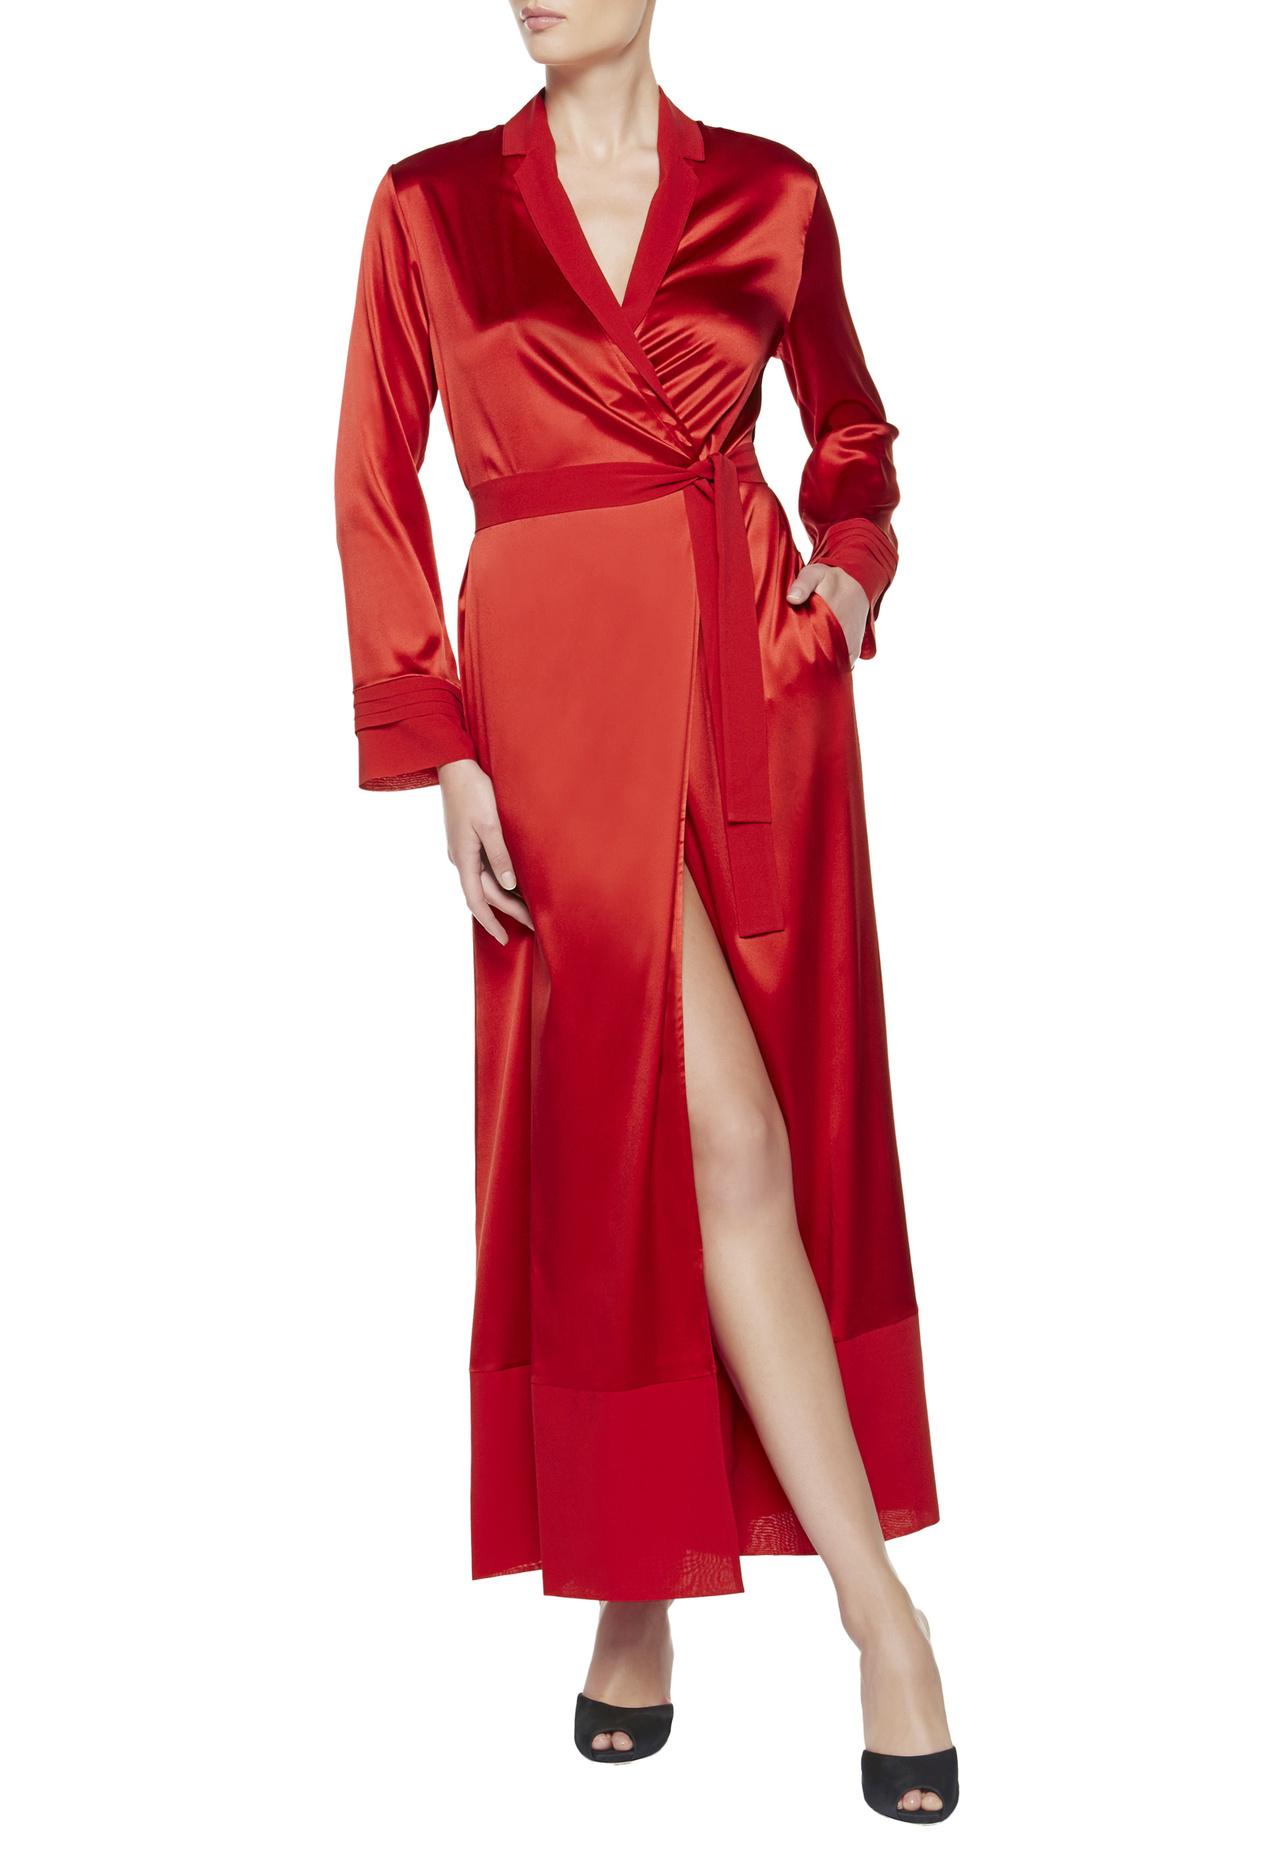 2018 New Sexy Women Black Red Lace Trim Satin Robe Mini ... |Red Silk Robe